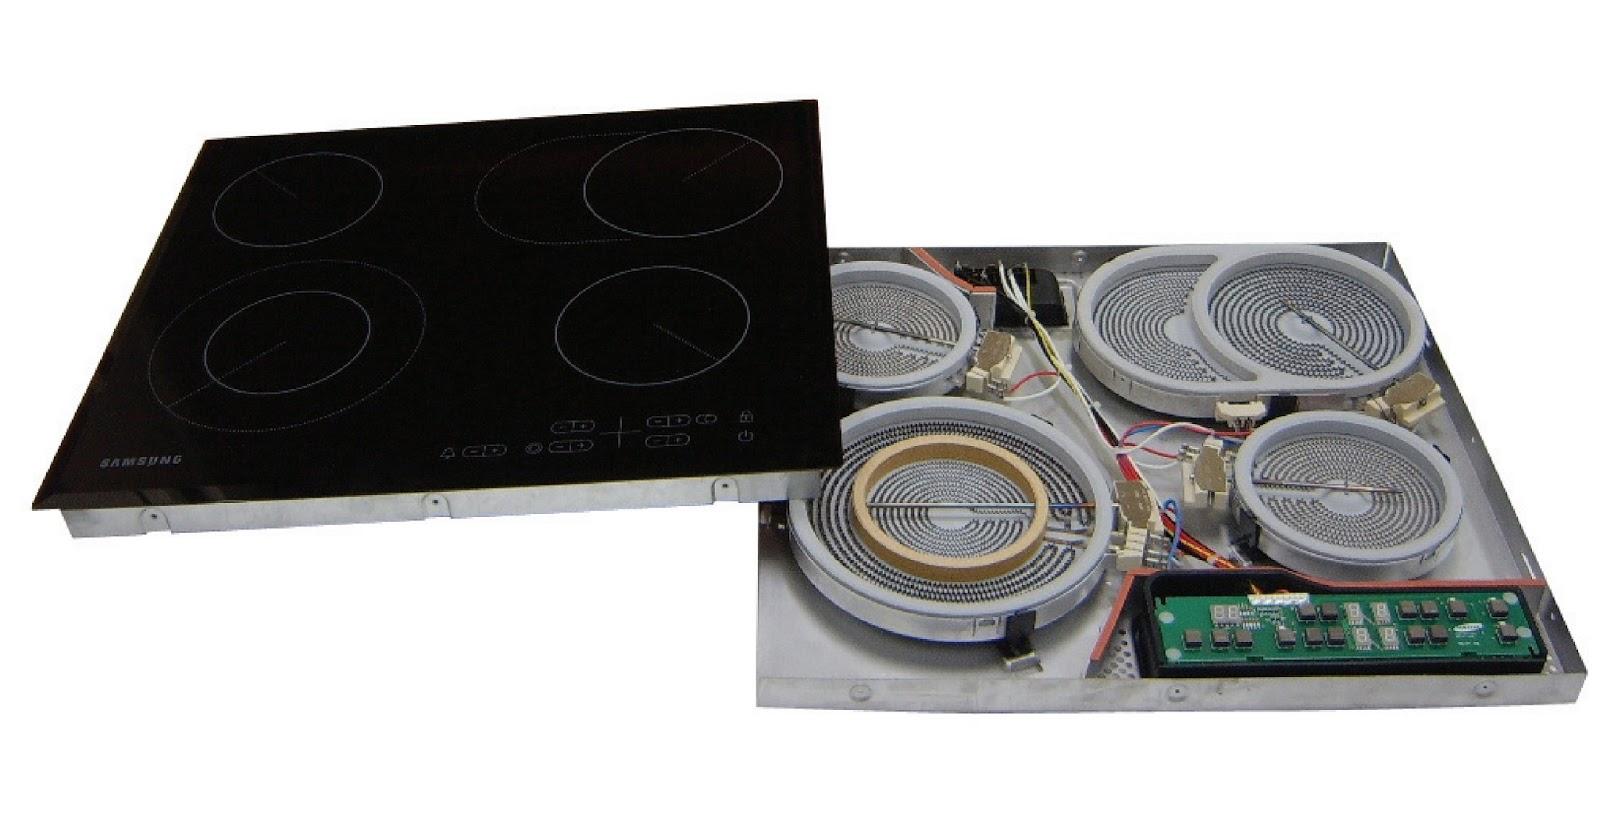 Electro Help  Samsung Ceramic Glass Hob C61rcast - Repair Help